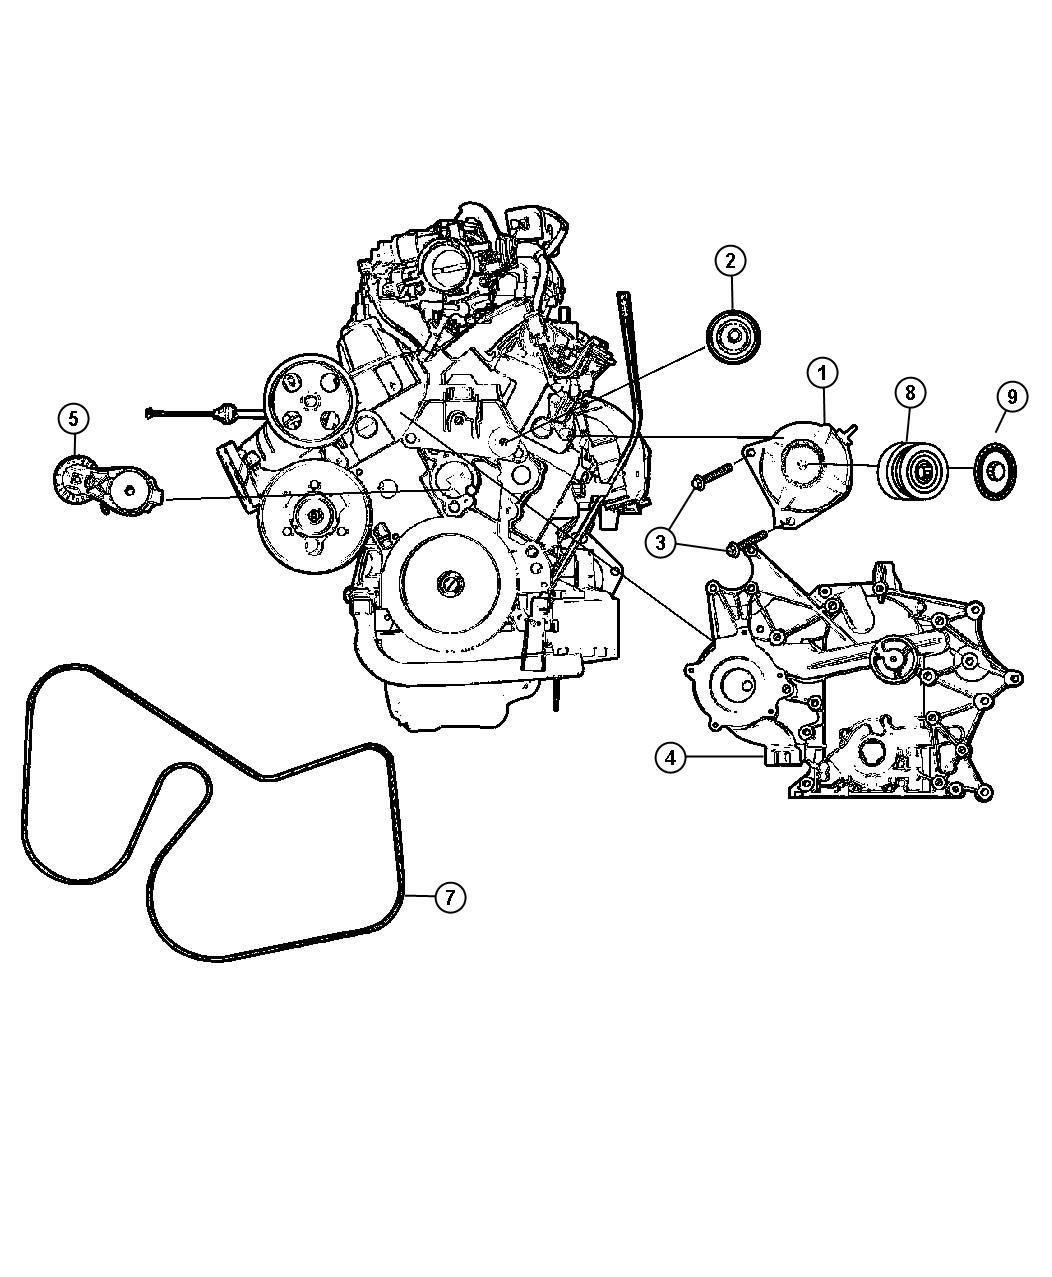 Dodge Grand Caravan Generator Engine Alternator